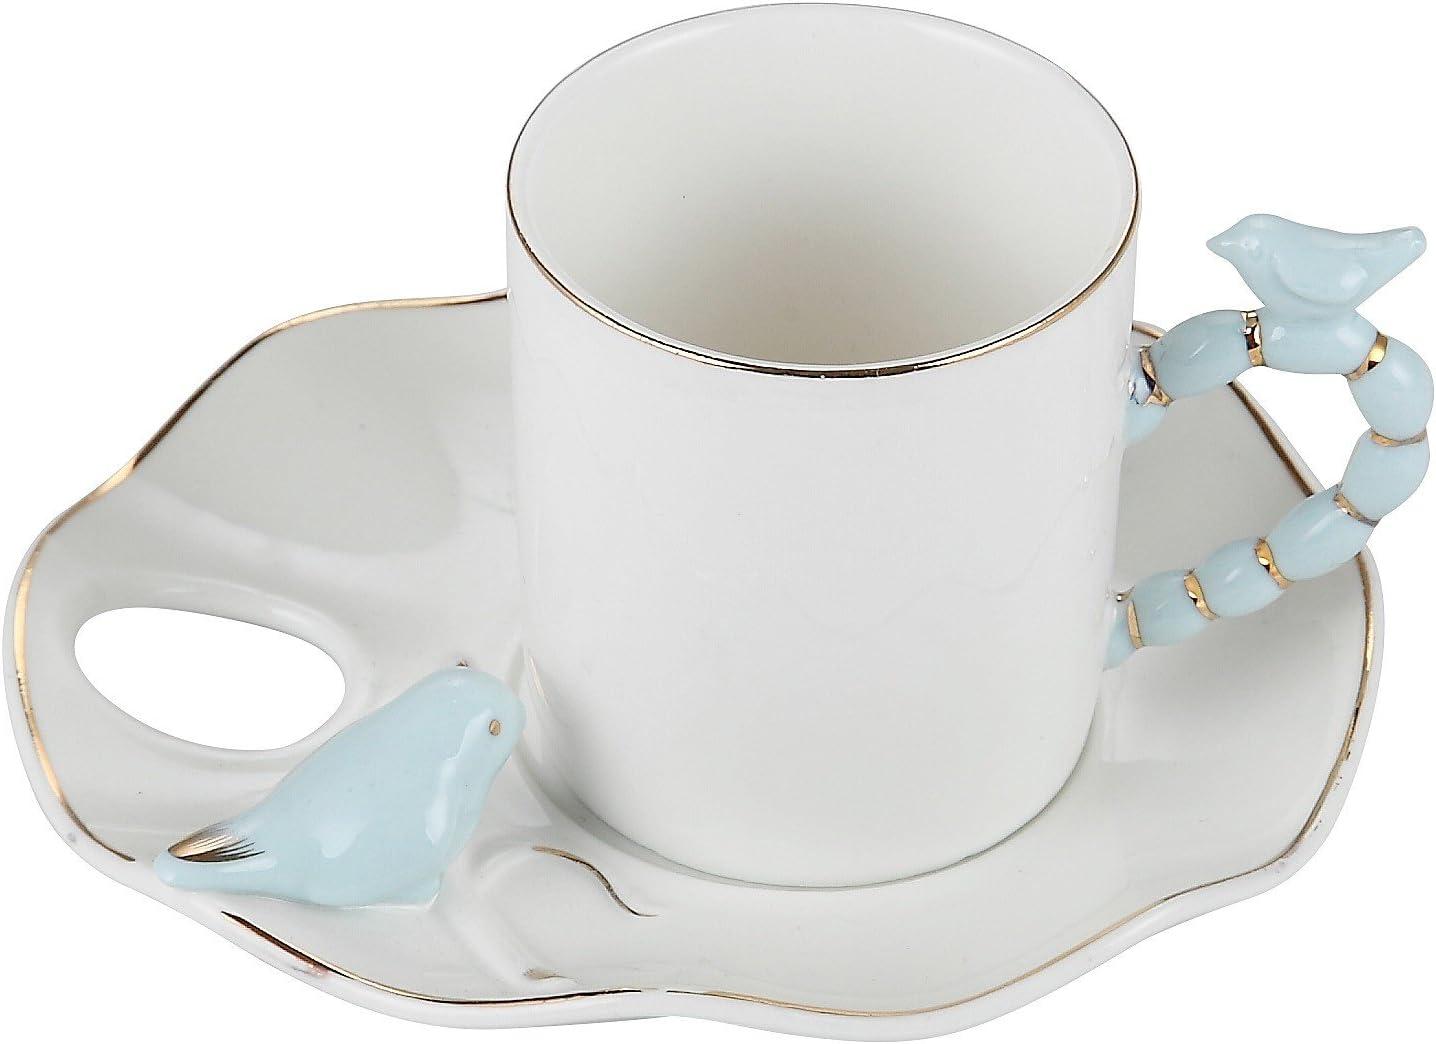 Porcelain Bone China Espresso Turkish Coffee Demitasse Set of 6 Cups + Saucers with 3D Designs (Blue Bird)